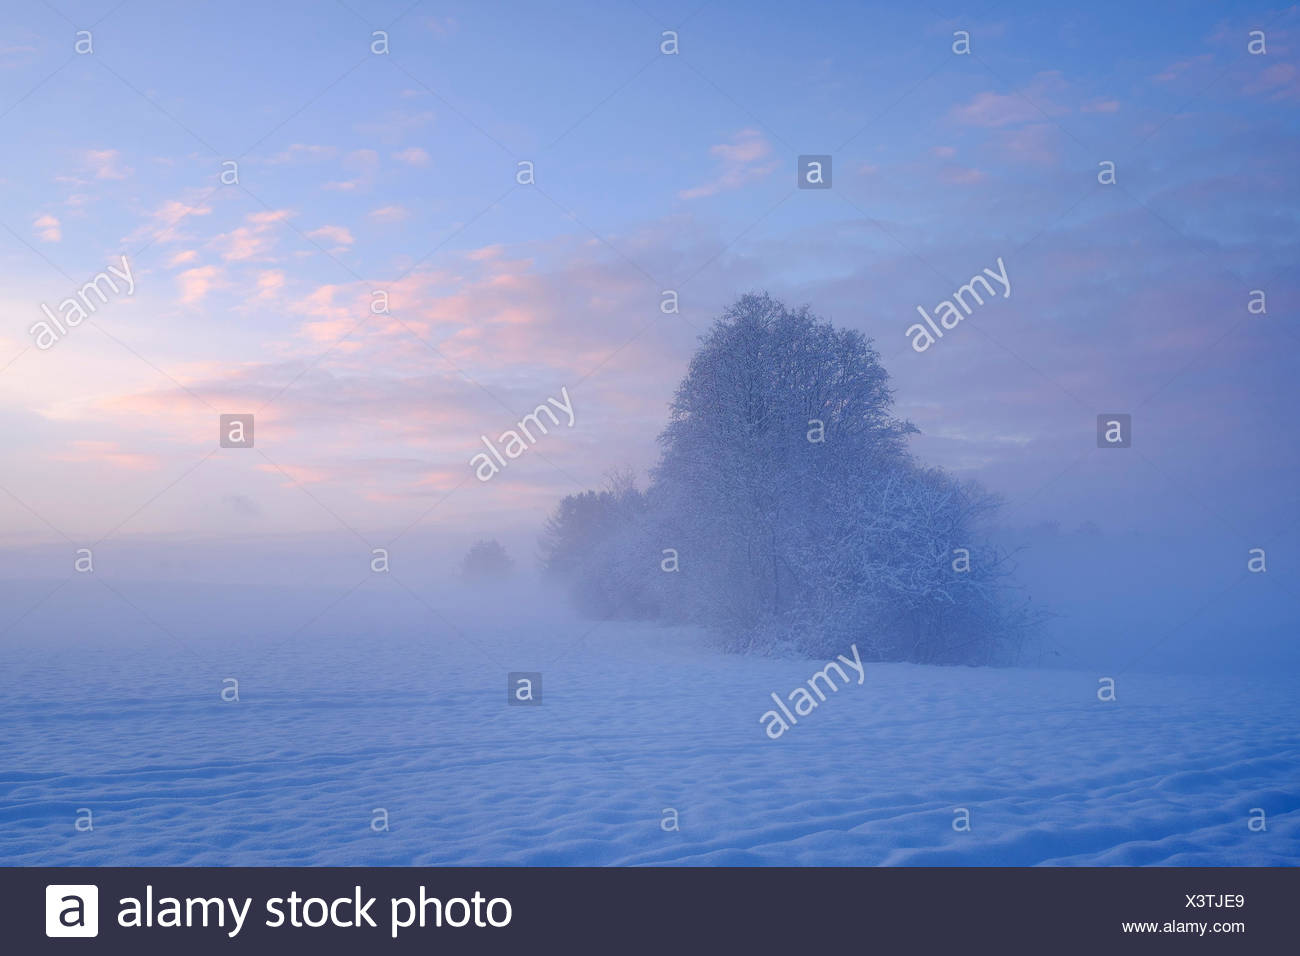 Germany, Gelting, mystical winter landscape at morning light - Stock Image